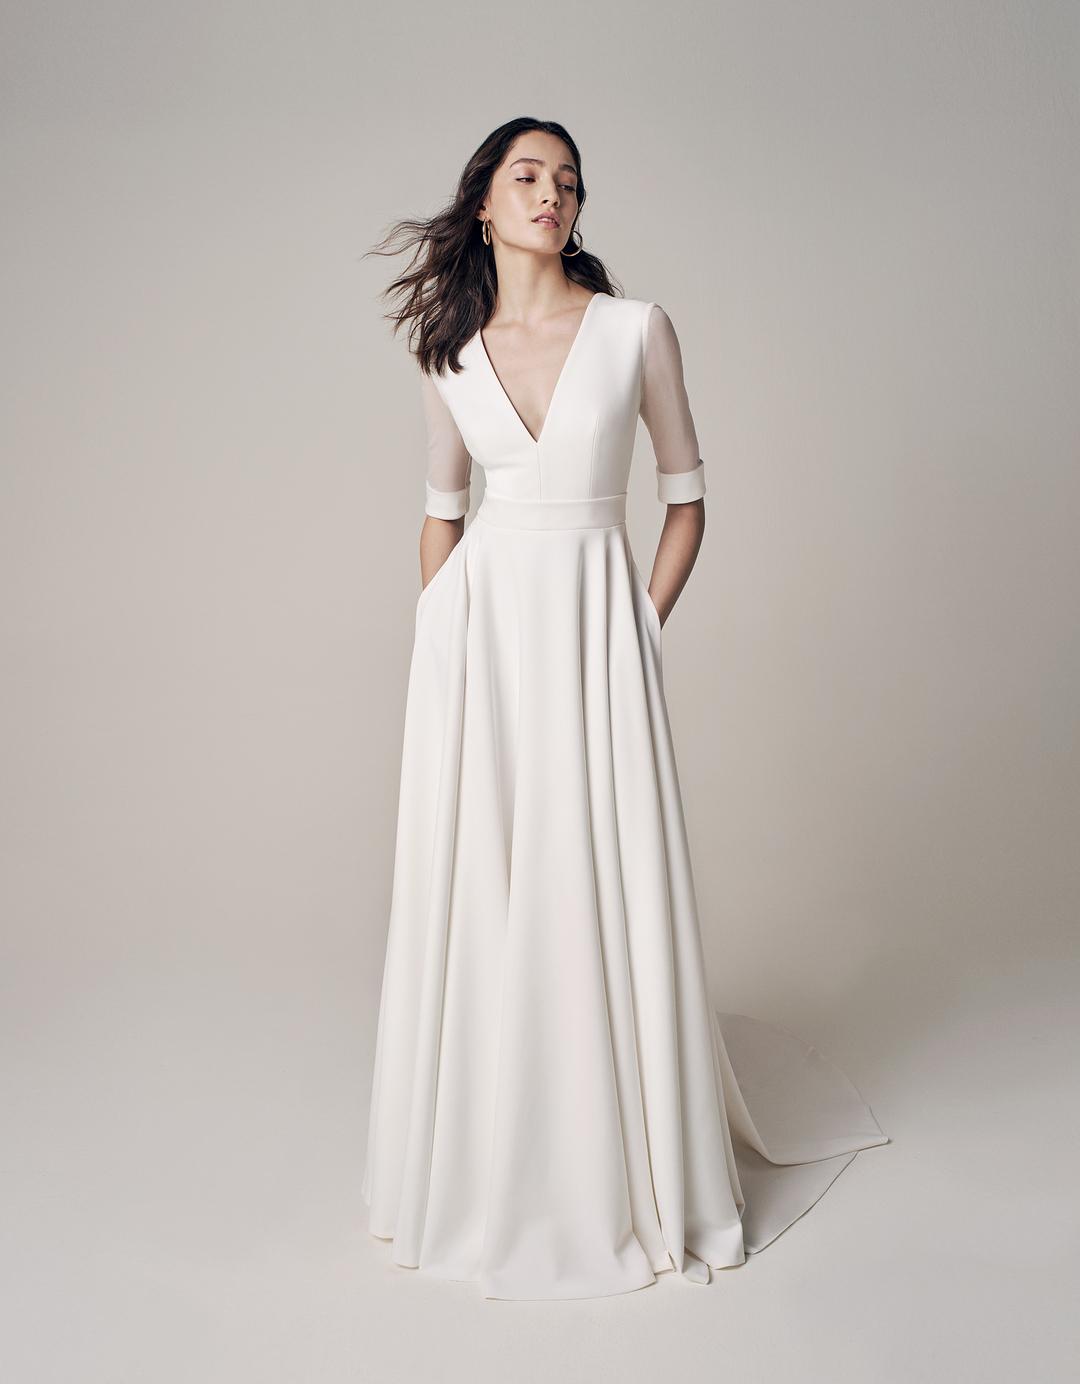 222 dress photo